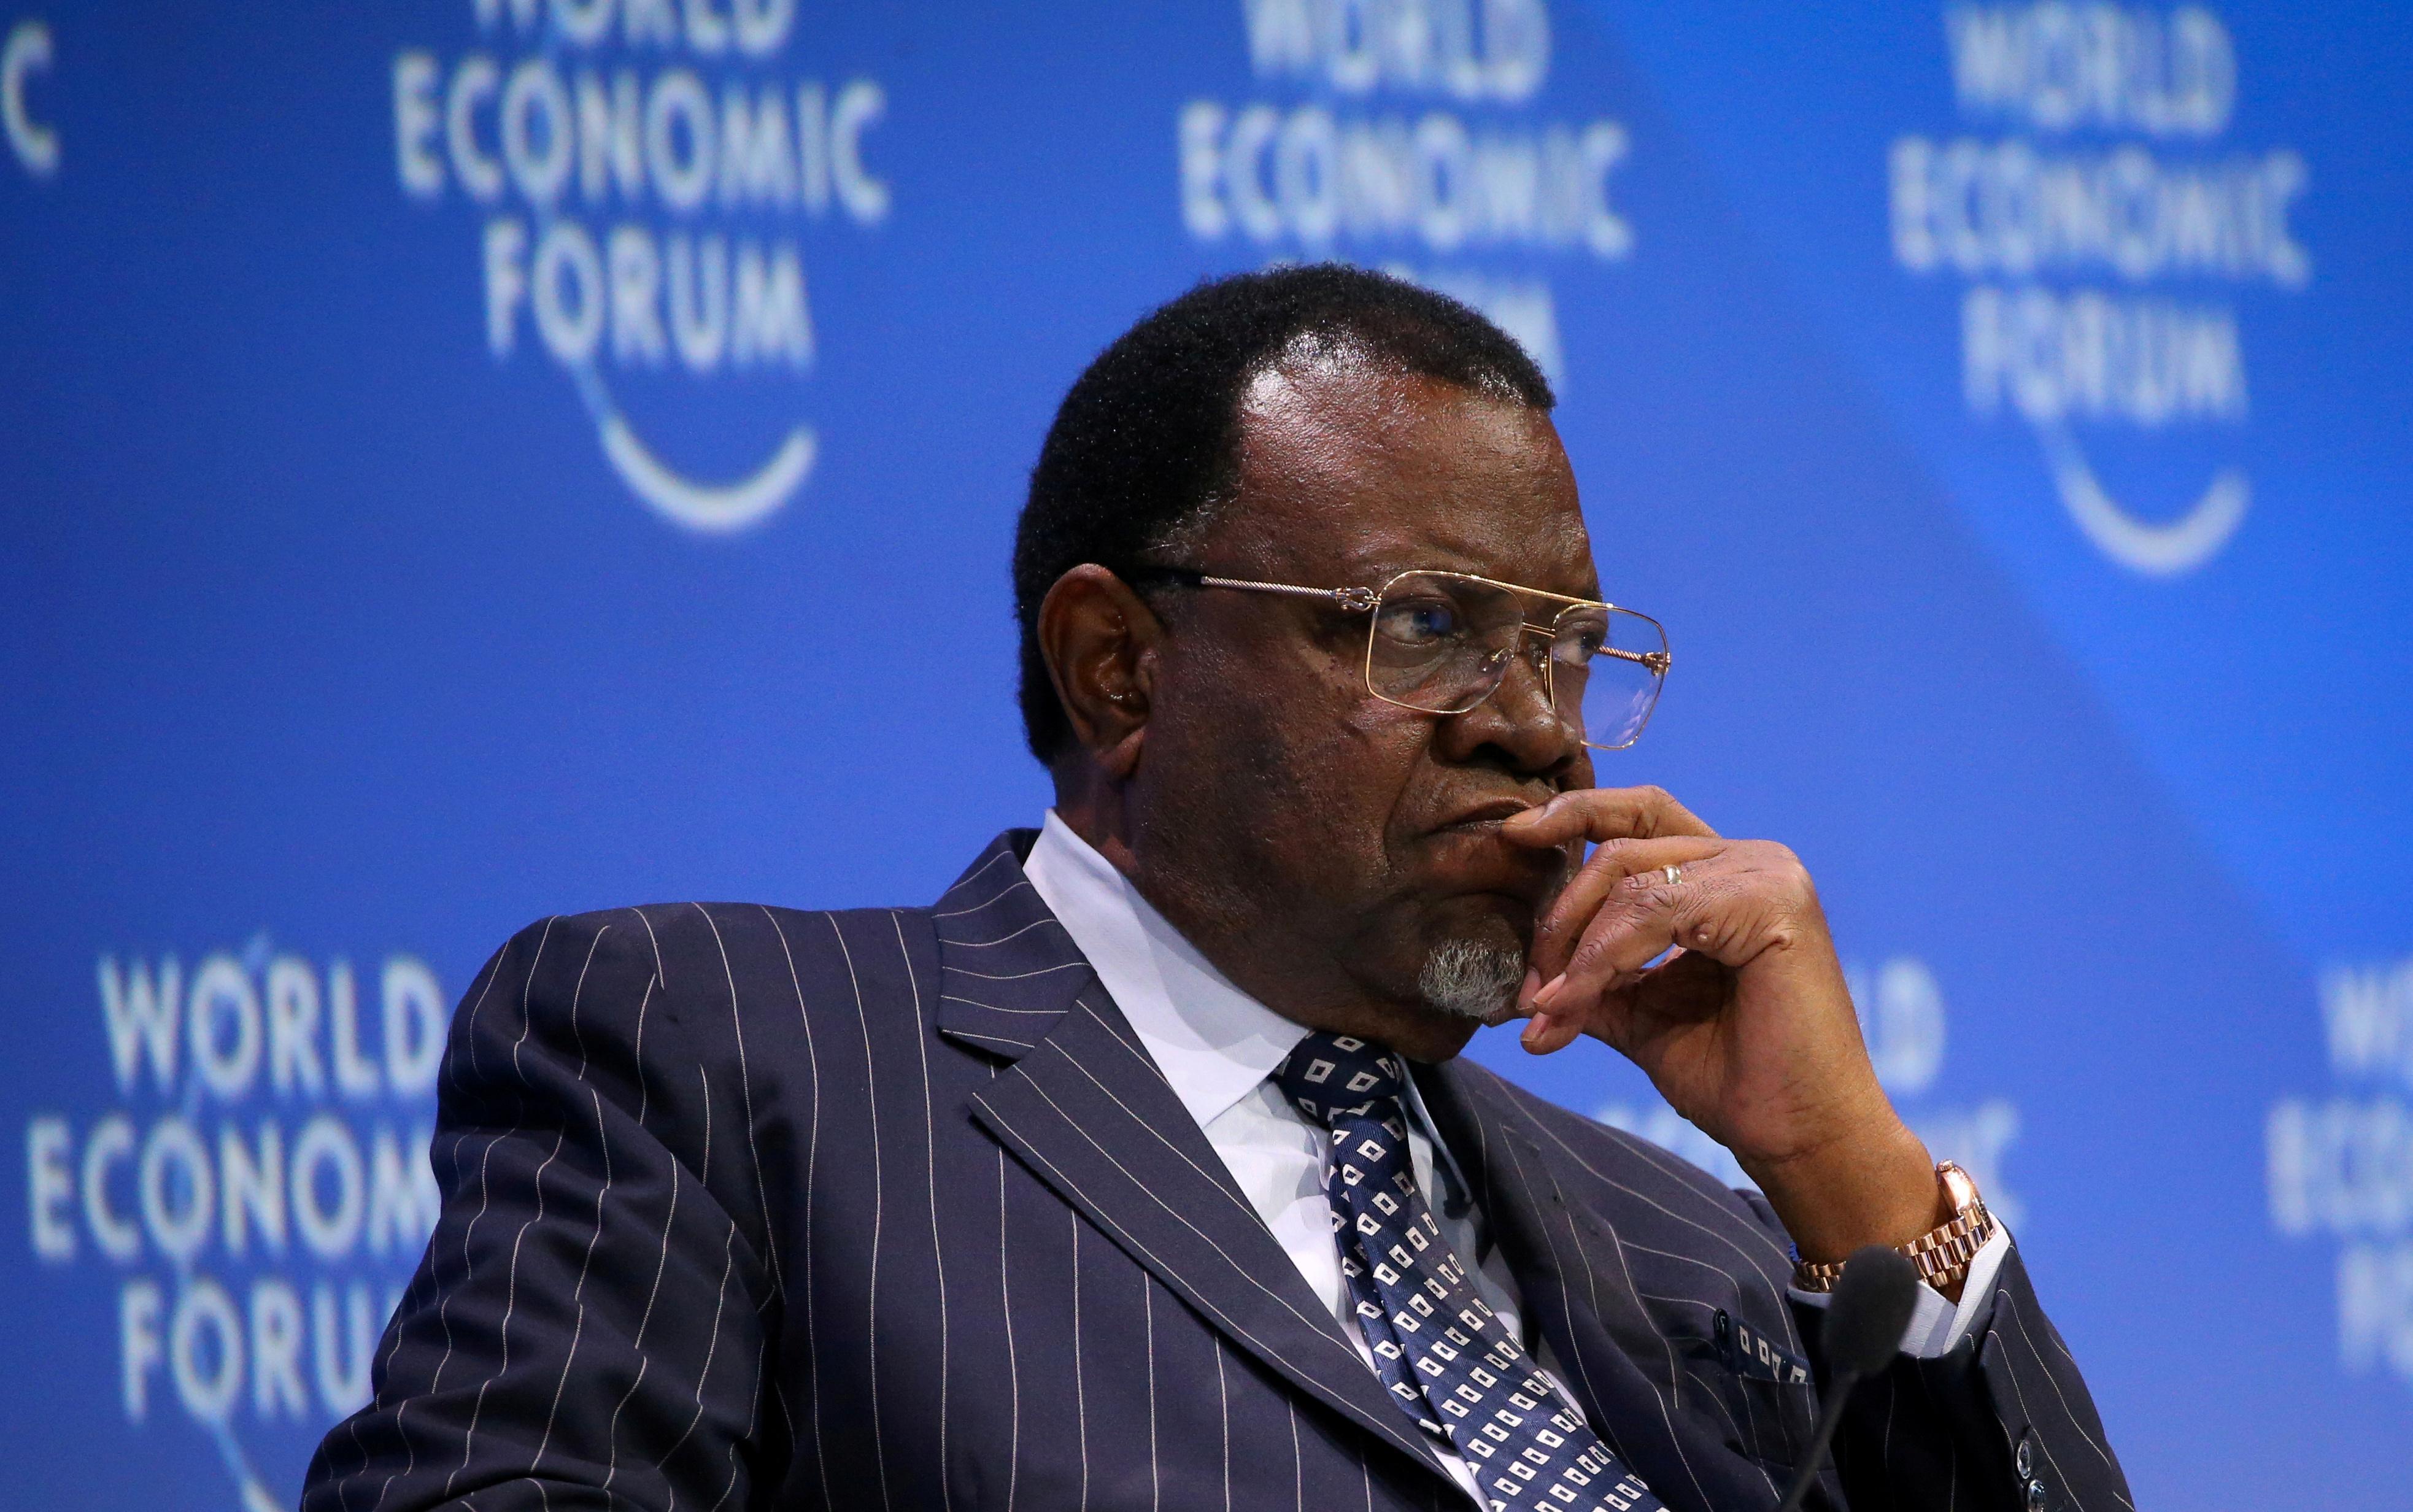 Namibian president set for re-election next month amid economic crisis